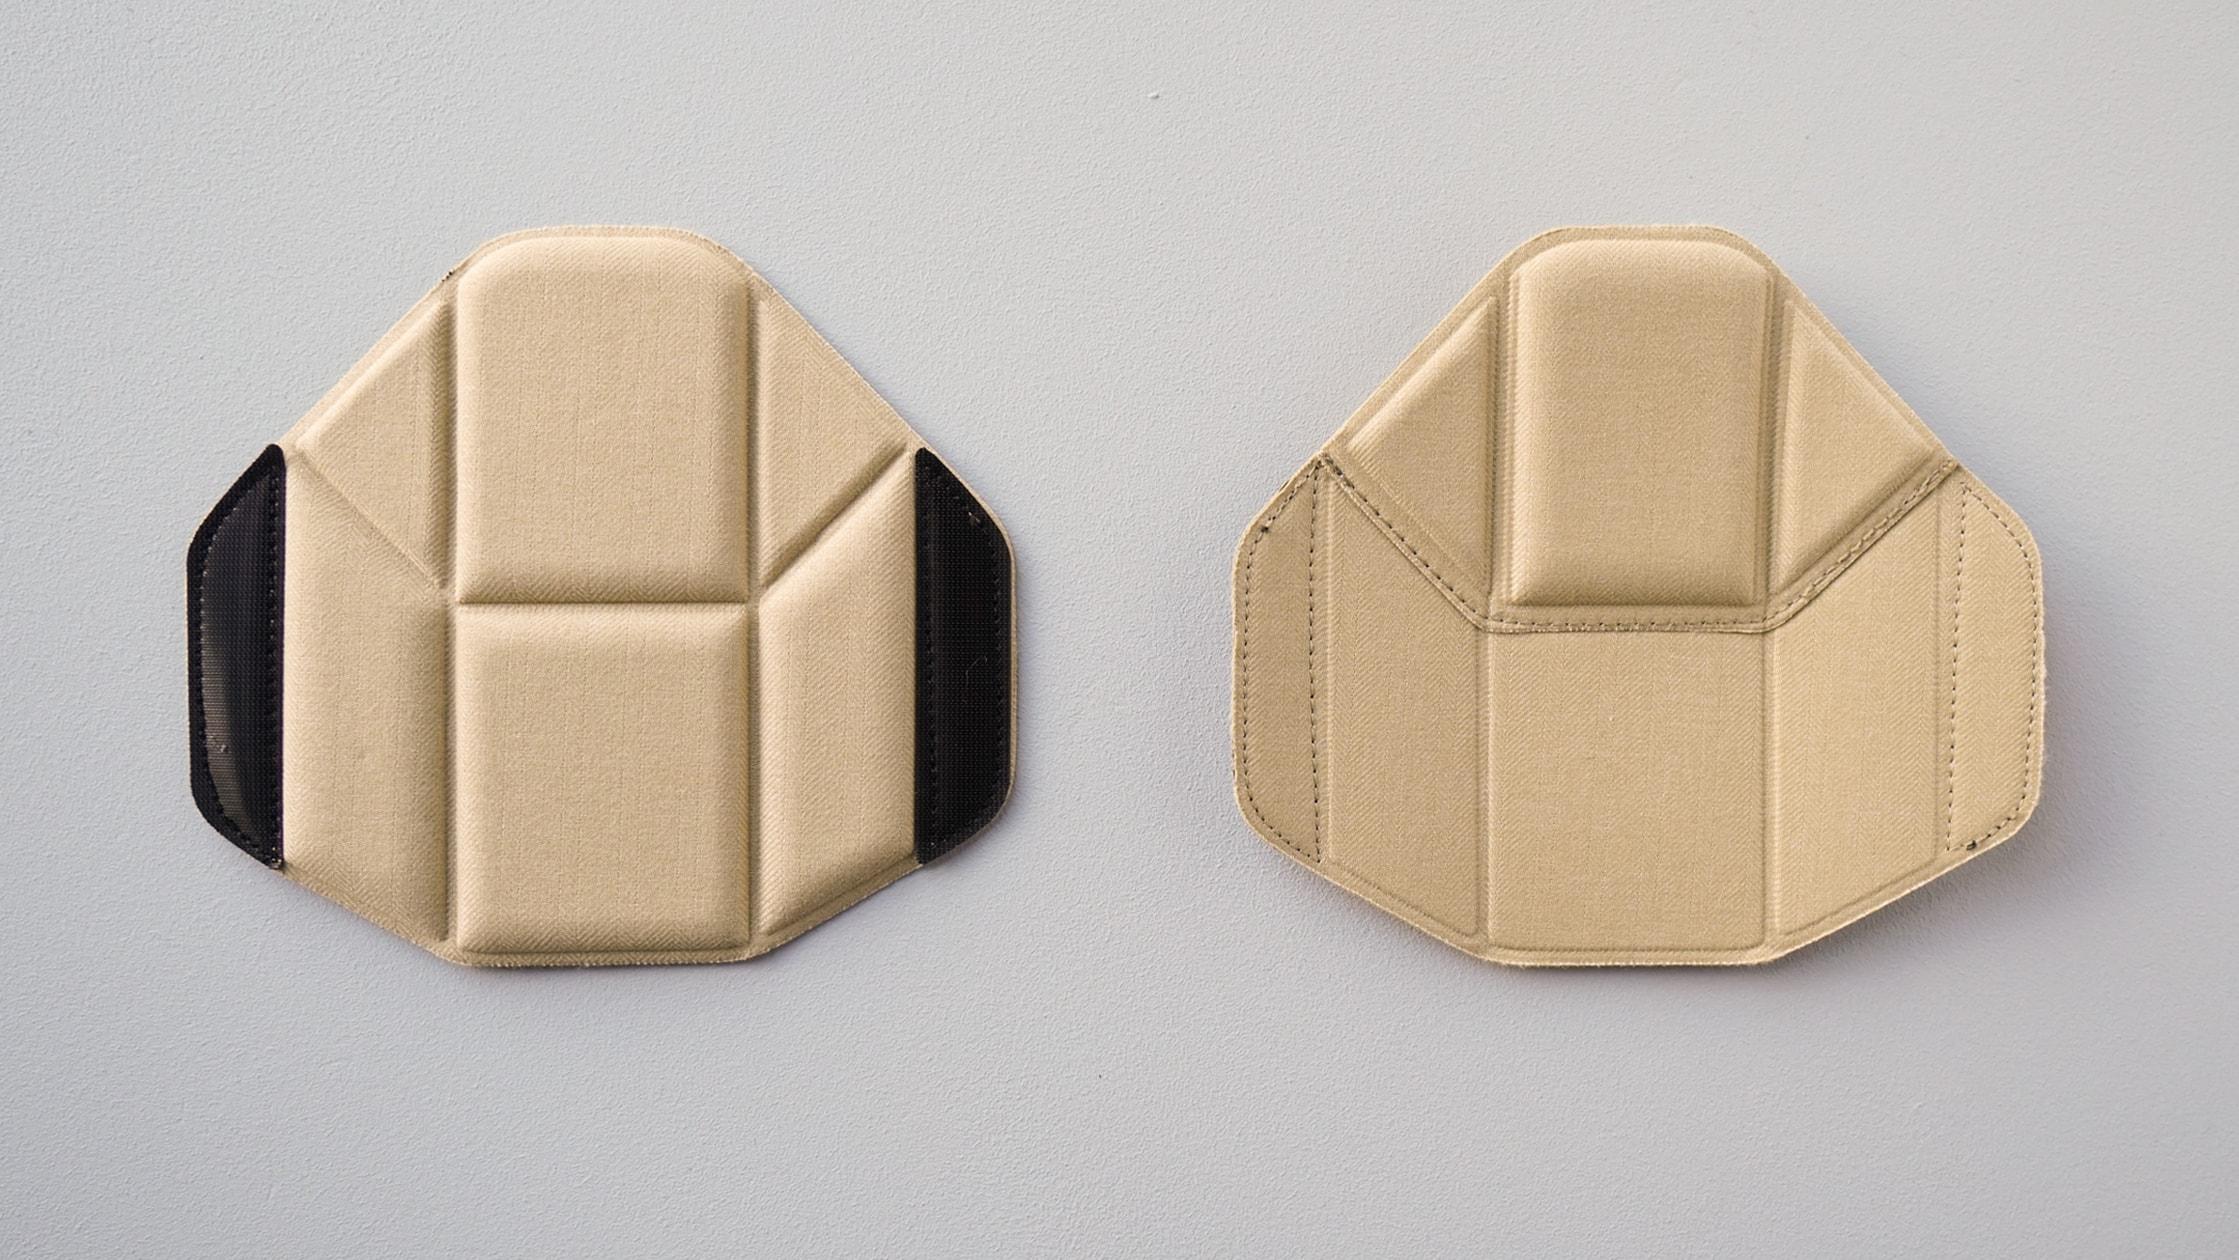 Peak Design Everyday Sling 5L Dividers